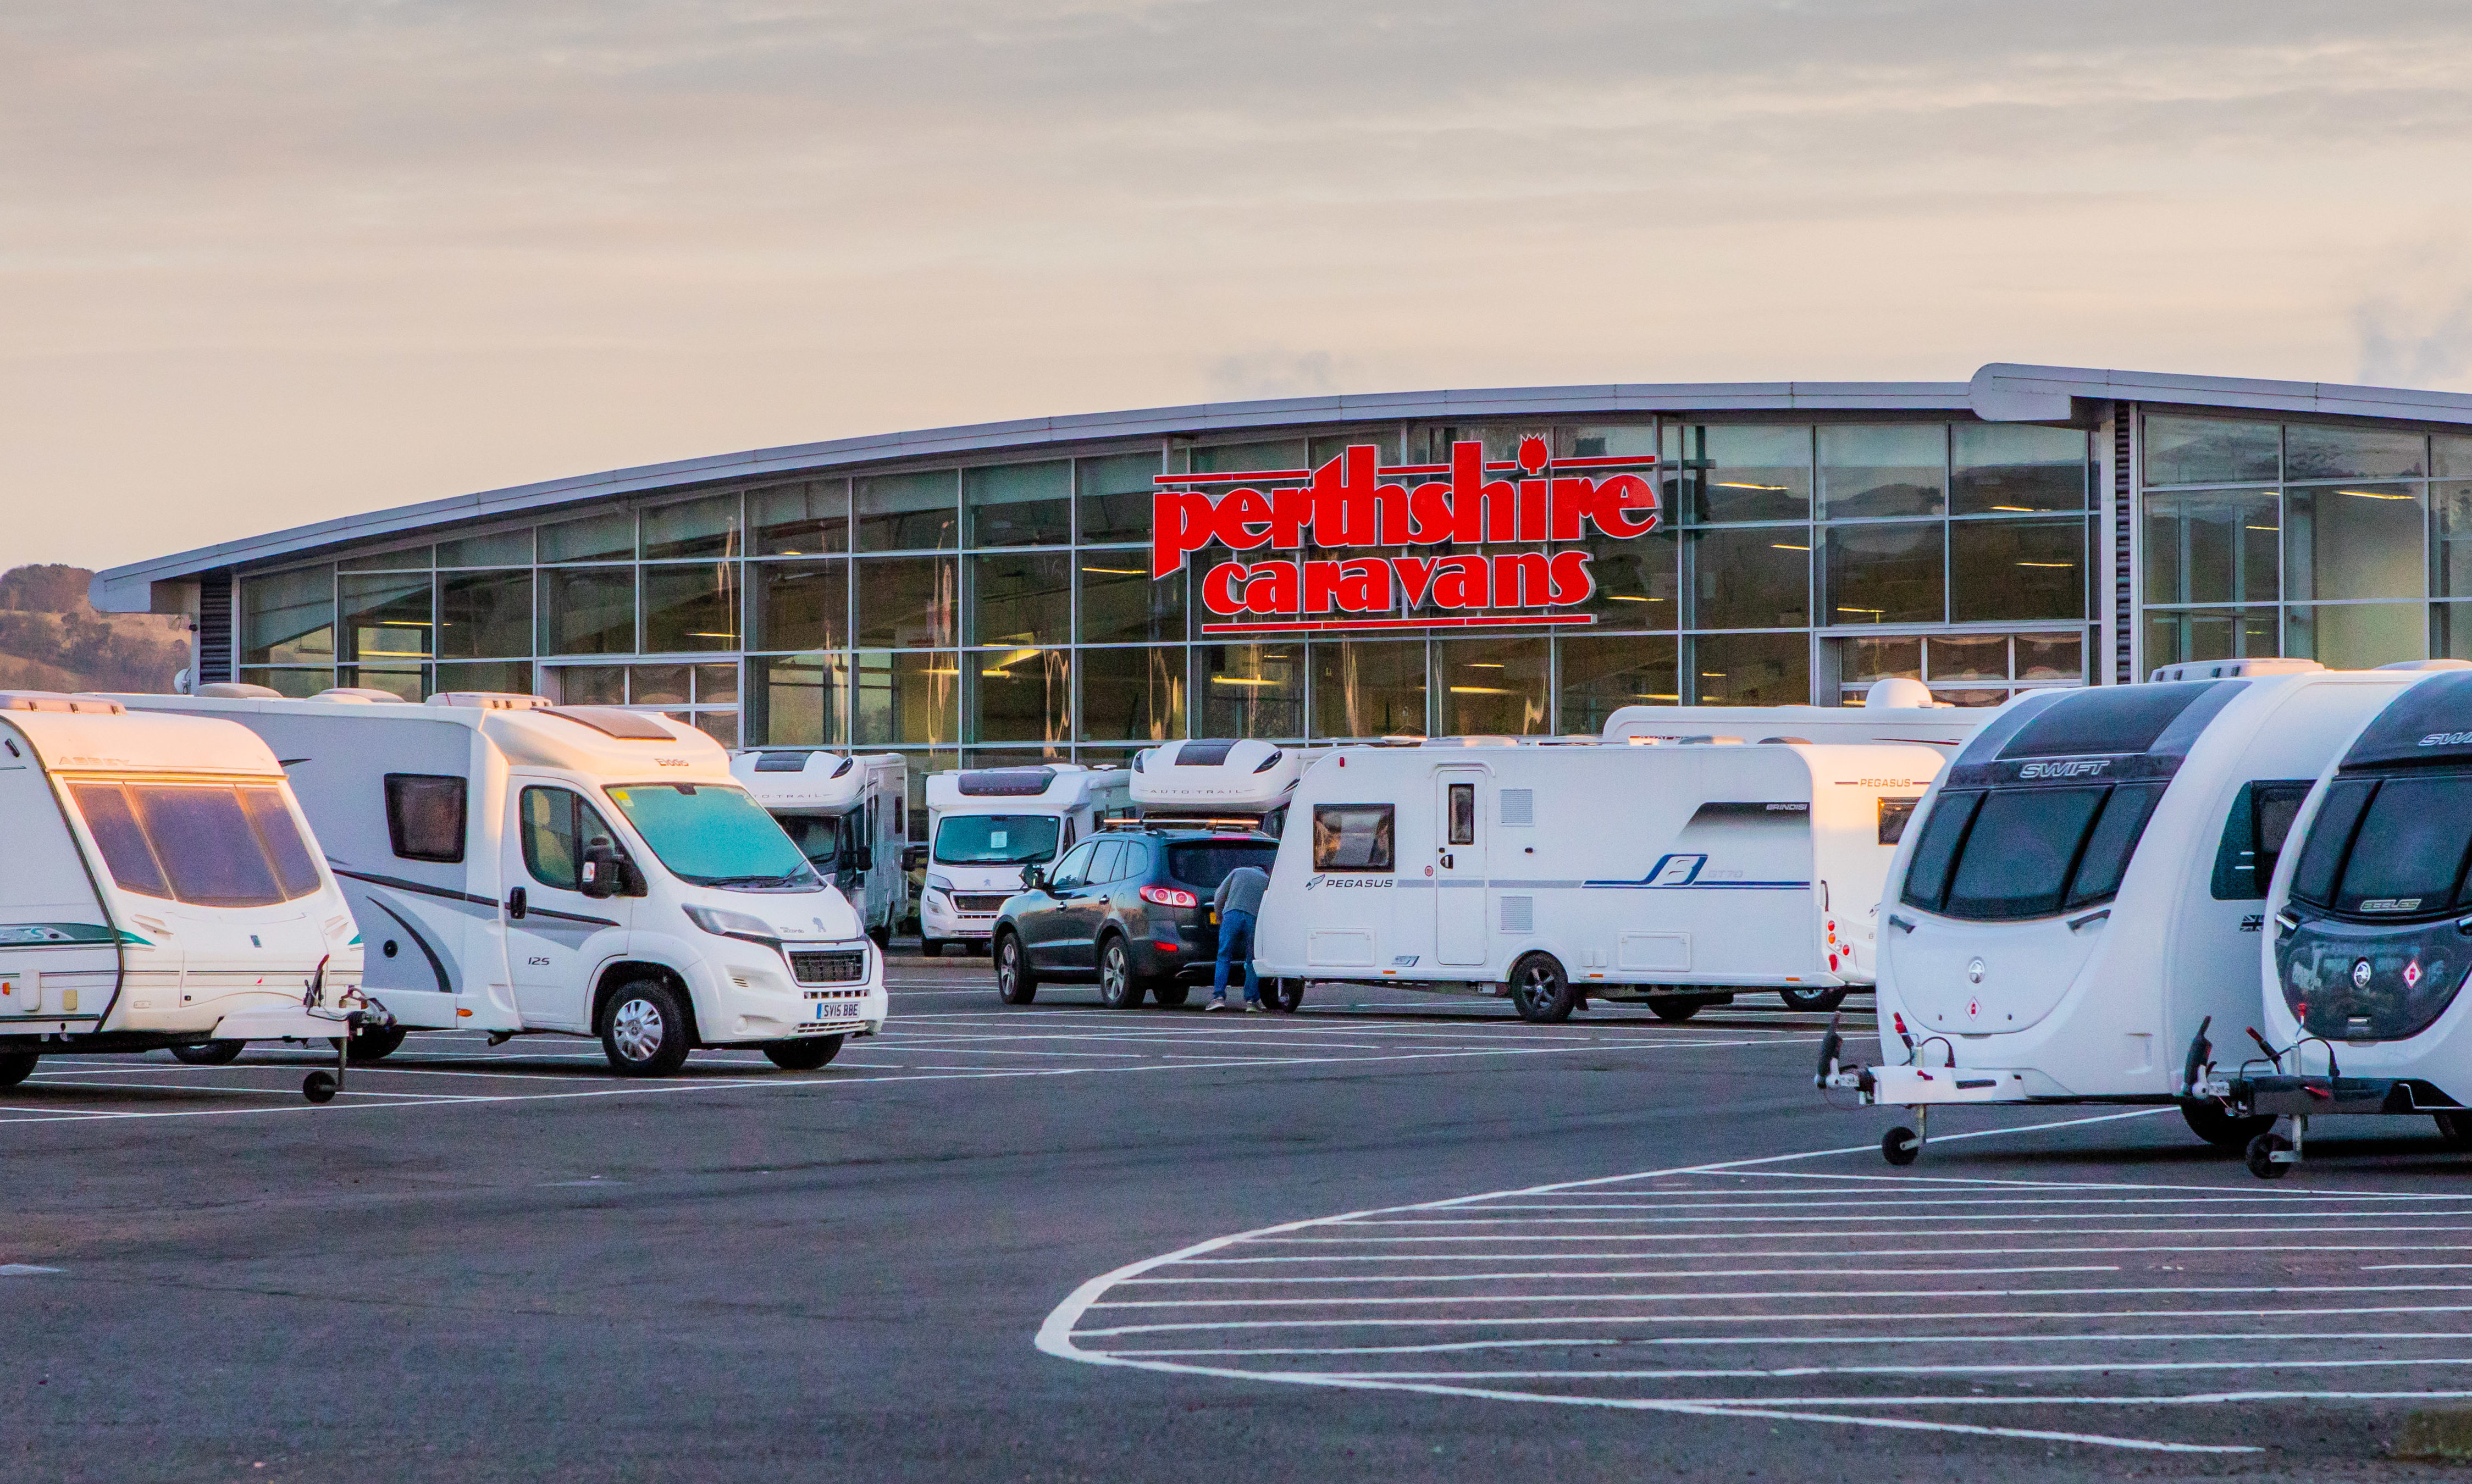 Perthshire Caravans.